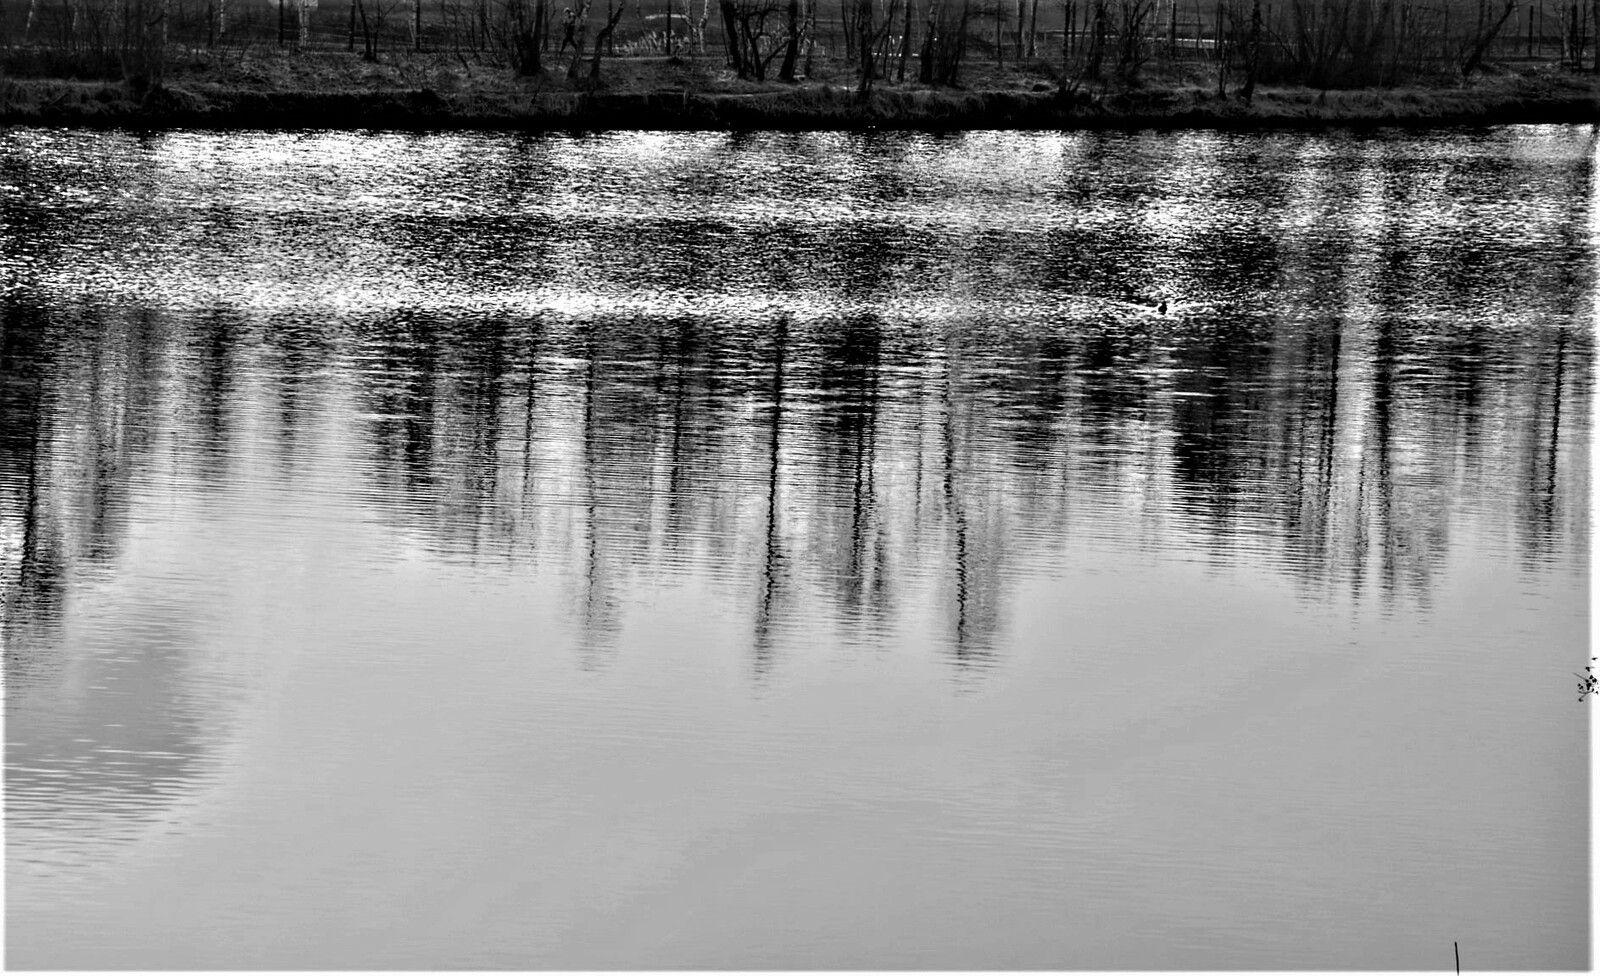 Reflektionen - Reflections S/W